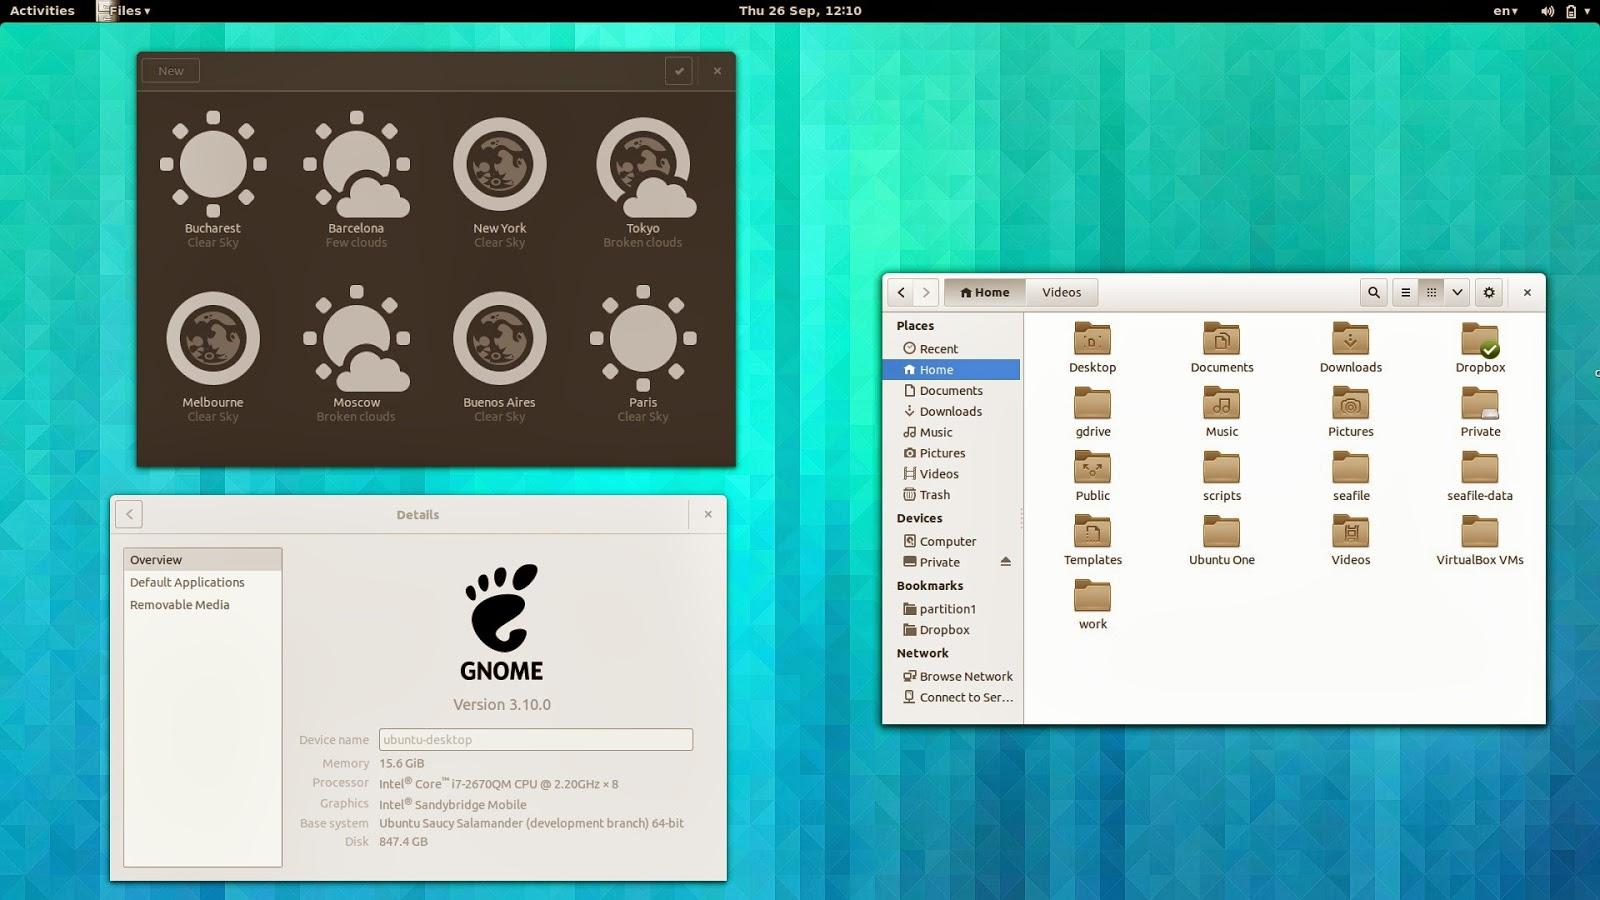 gnome3.10-ubuntu-saucy